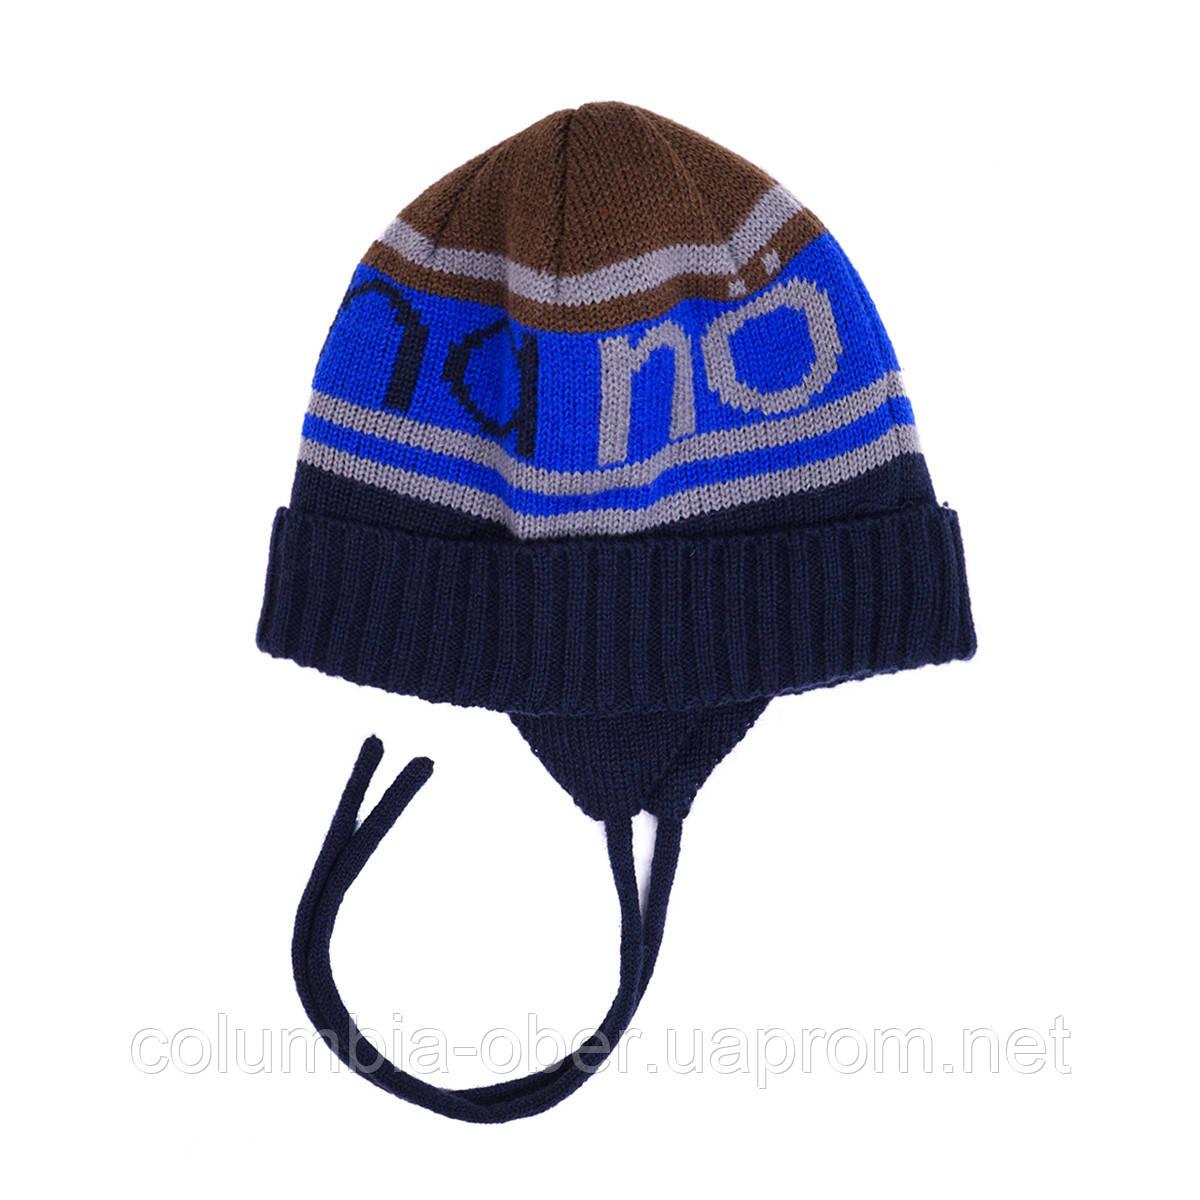 Зимняя шапка для мальчика Nano 251 TC F16. Размер 2/3Х -  7/12.